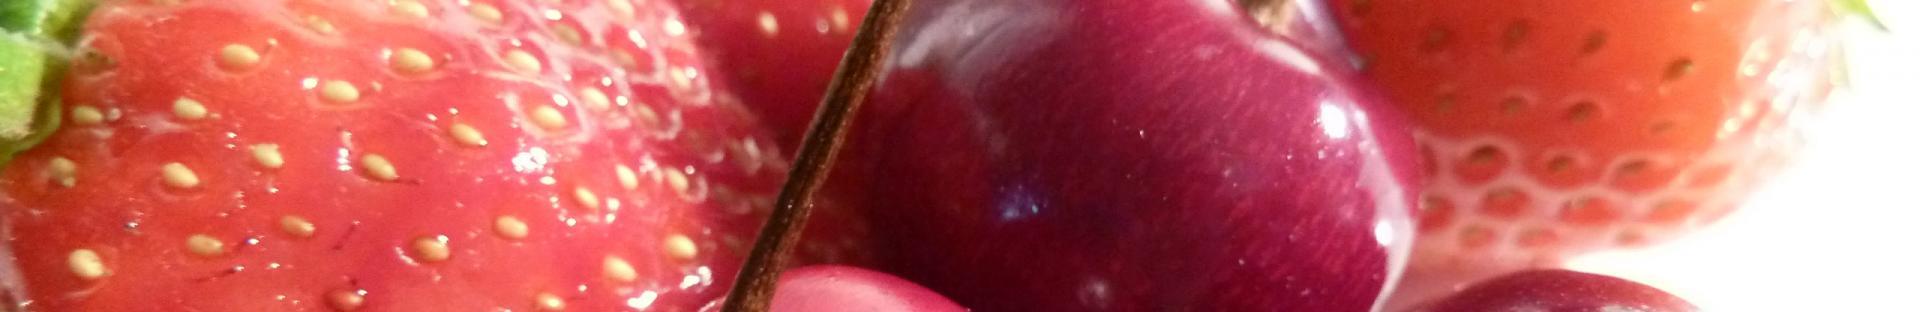 Fruits rouge